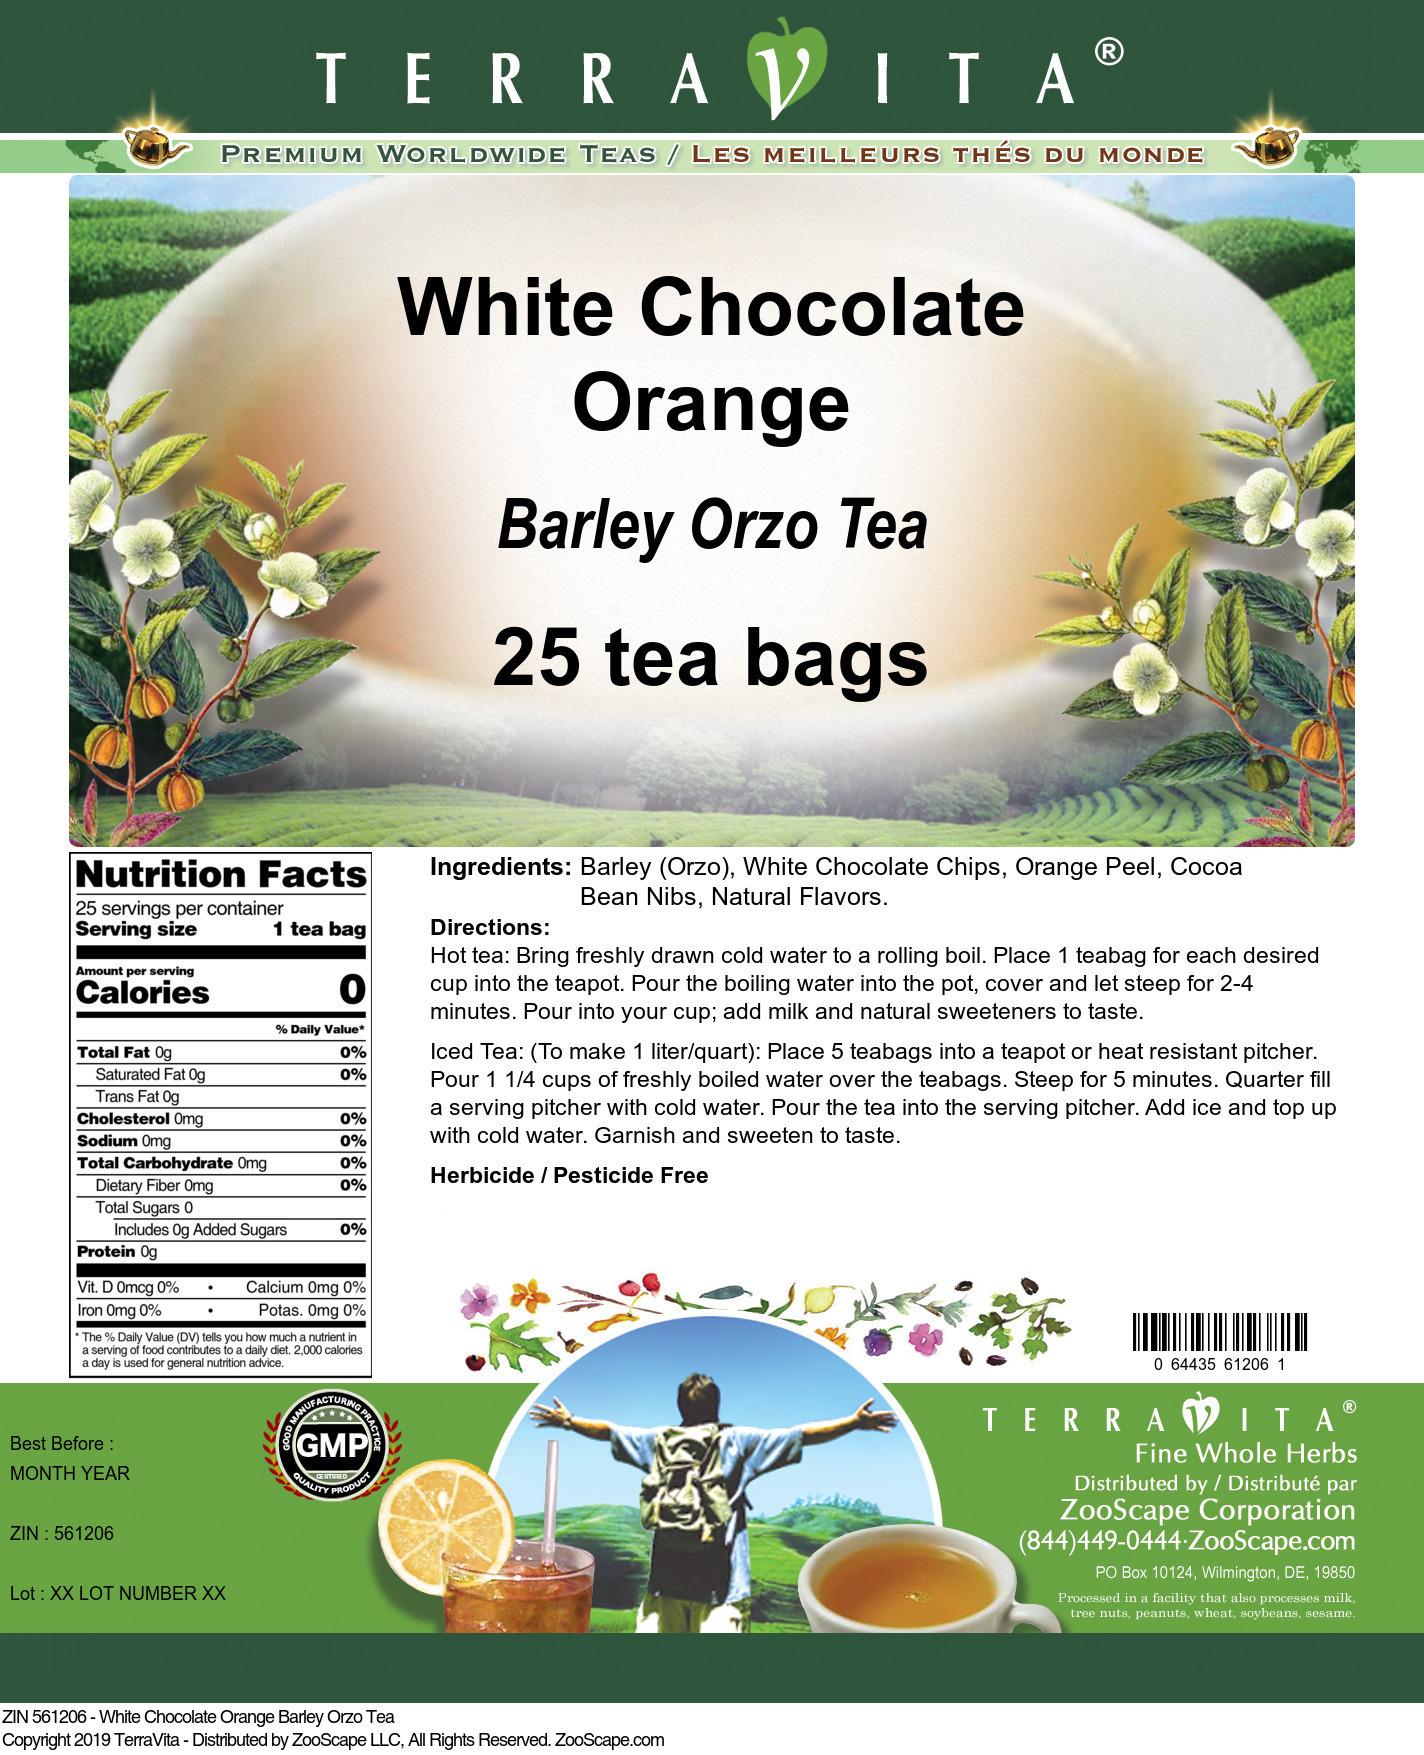 White Chocolate Orange Barley Orzo Tea